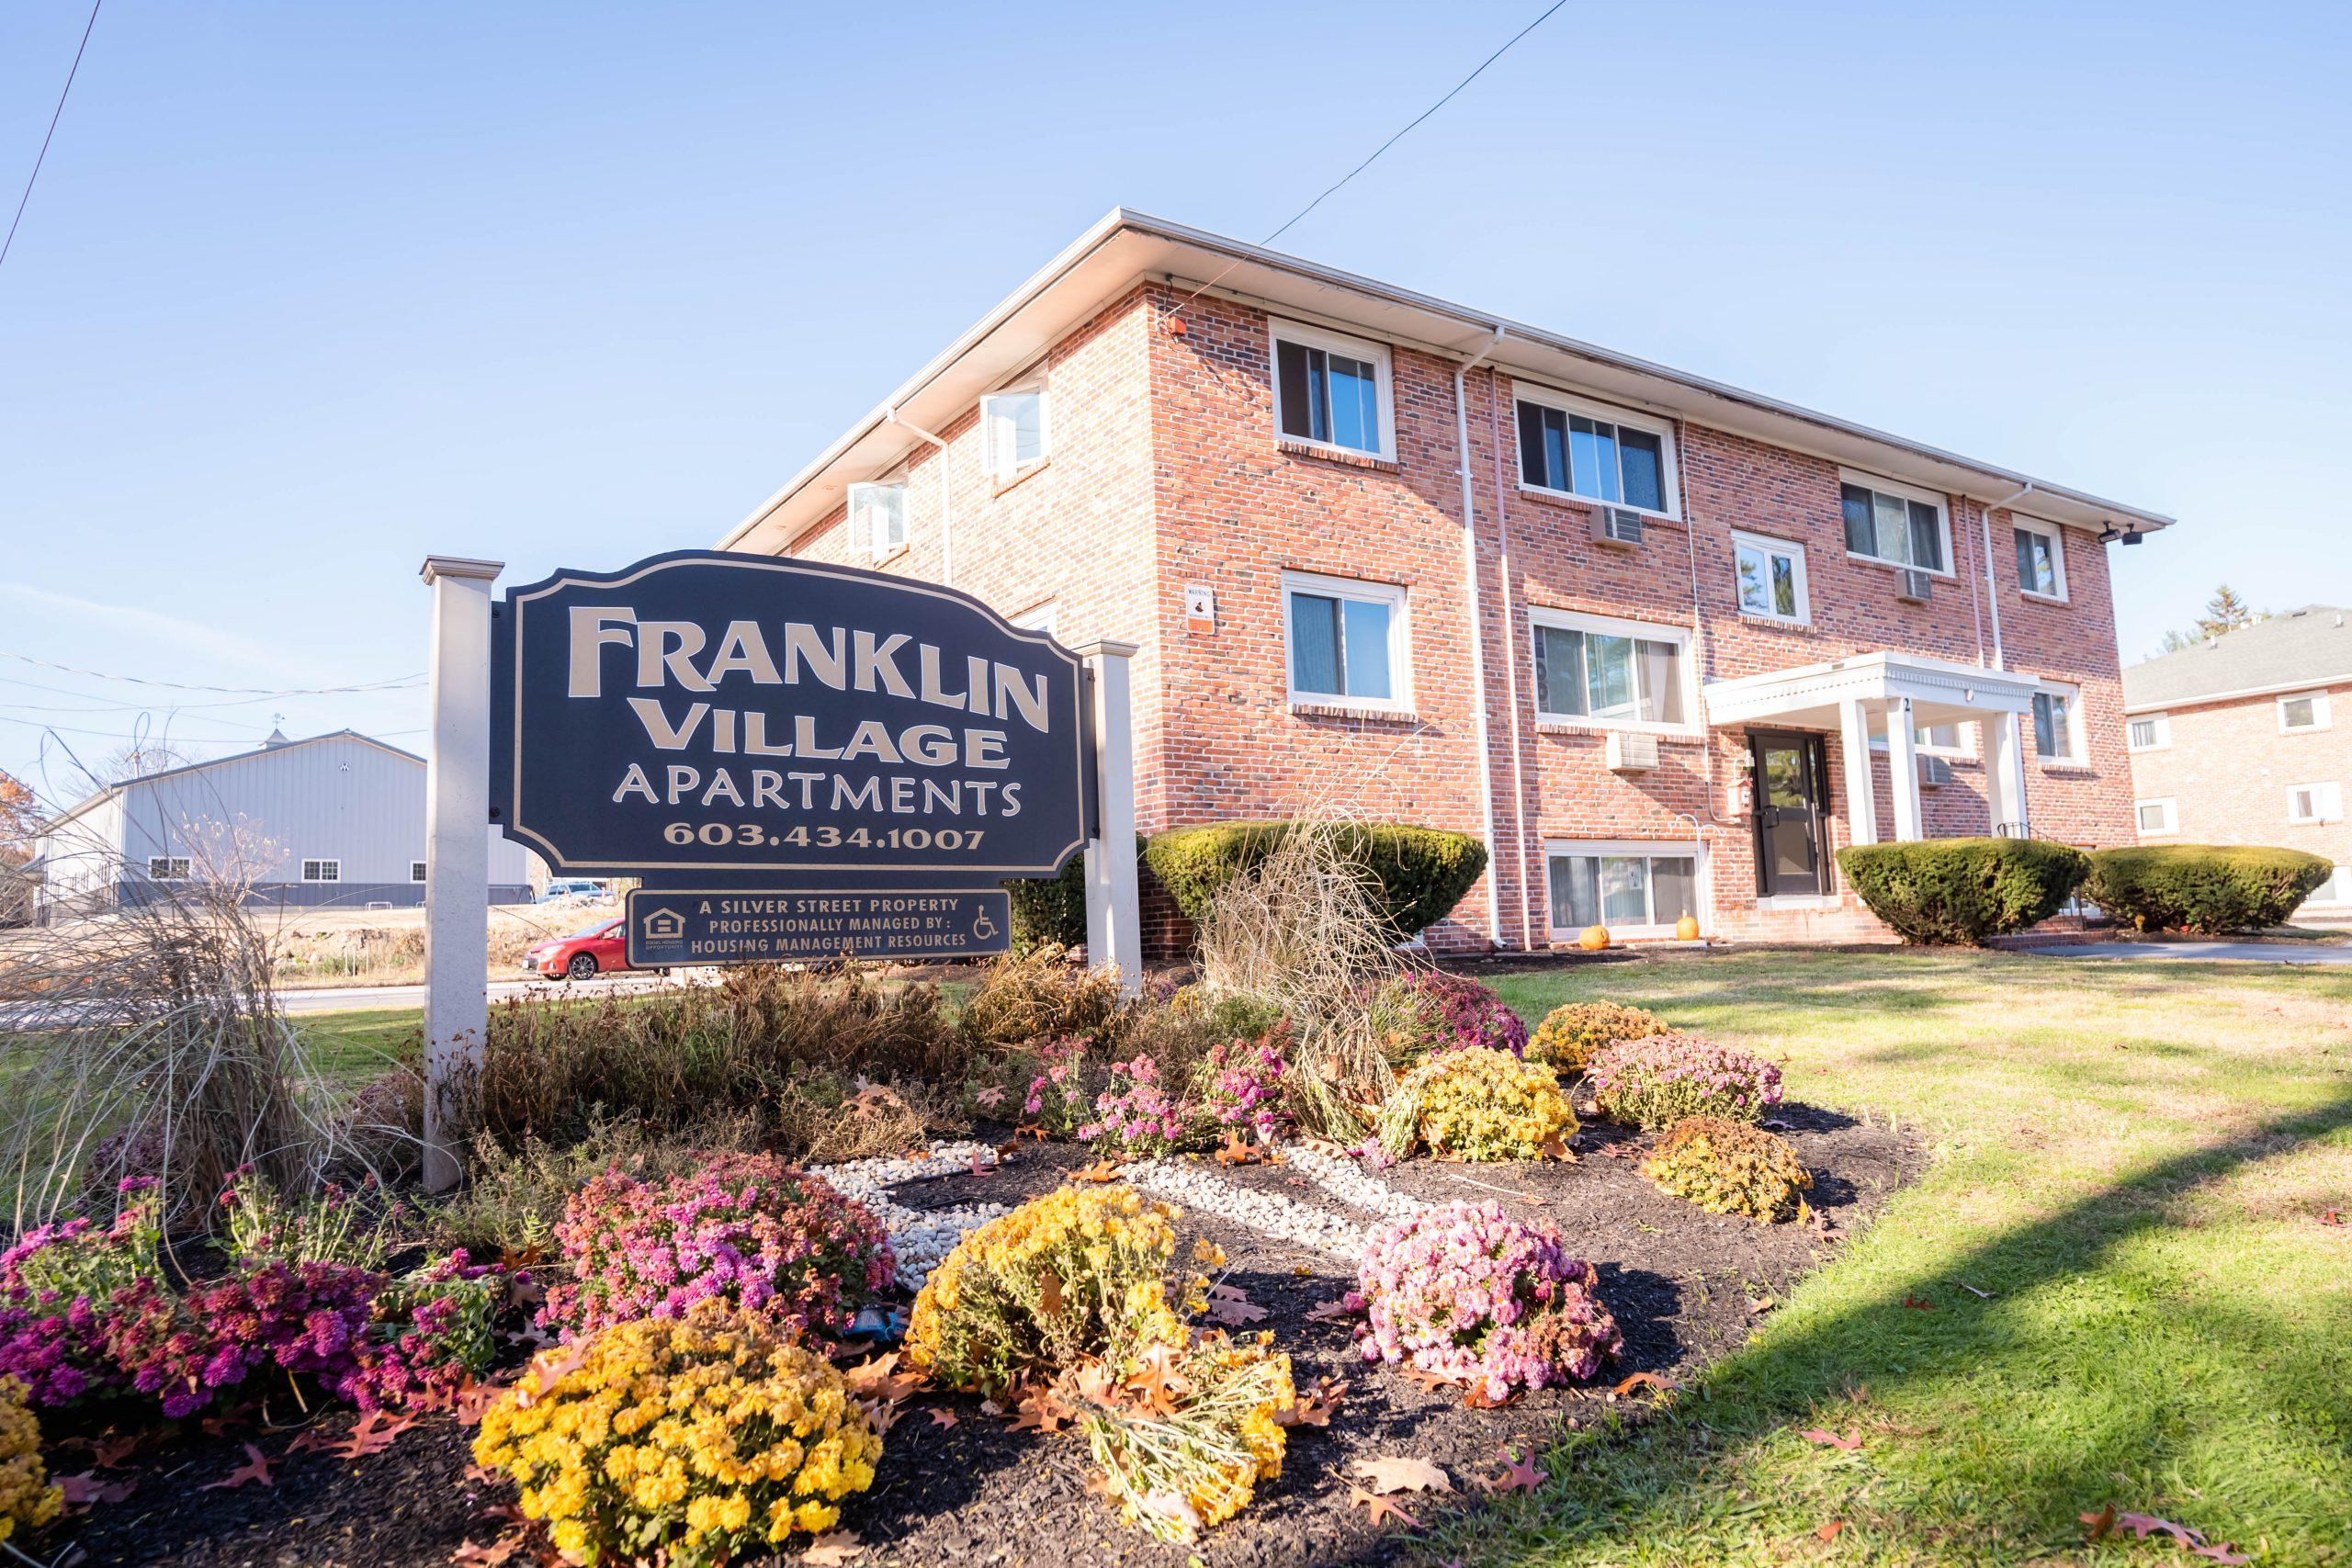 Franklin Village Derry, New Hampshire